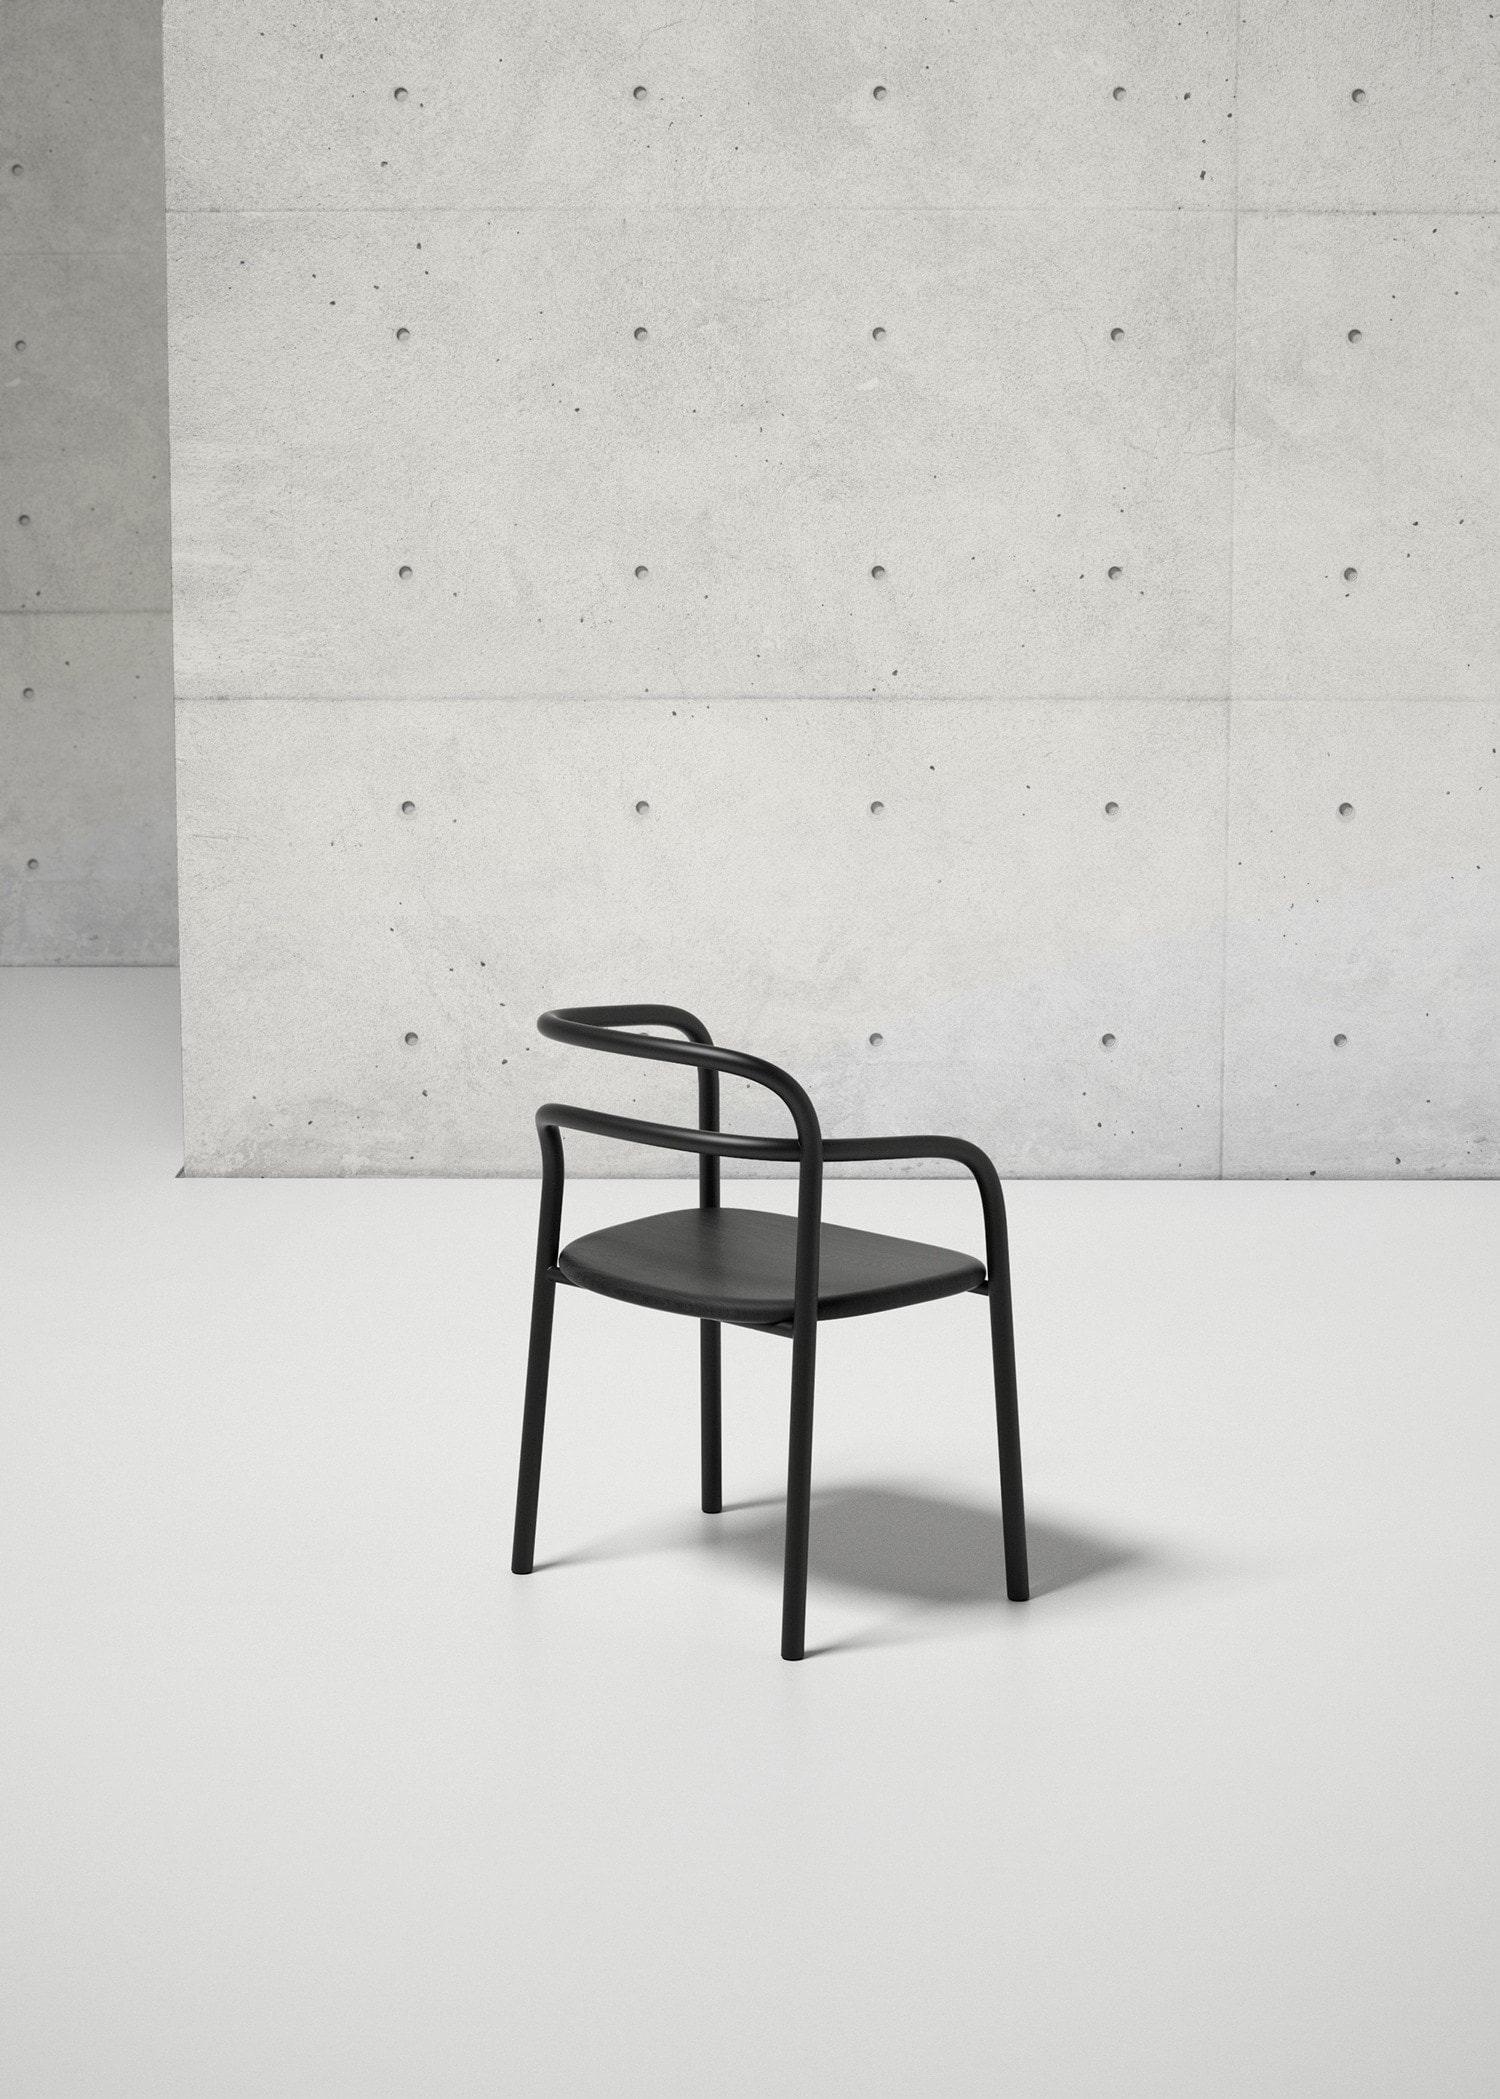 design studio Yonsei beautifull - minimalissimo | ello